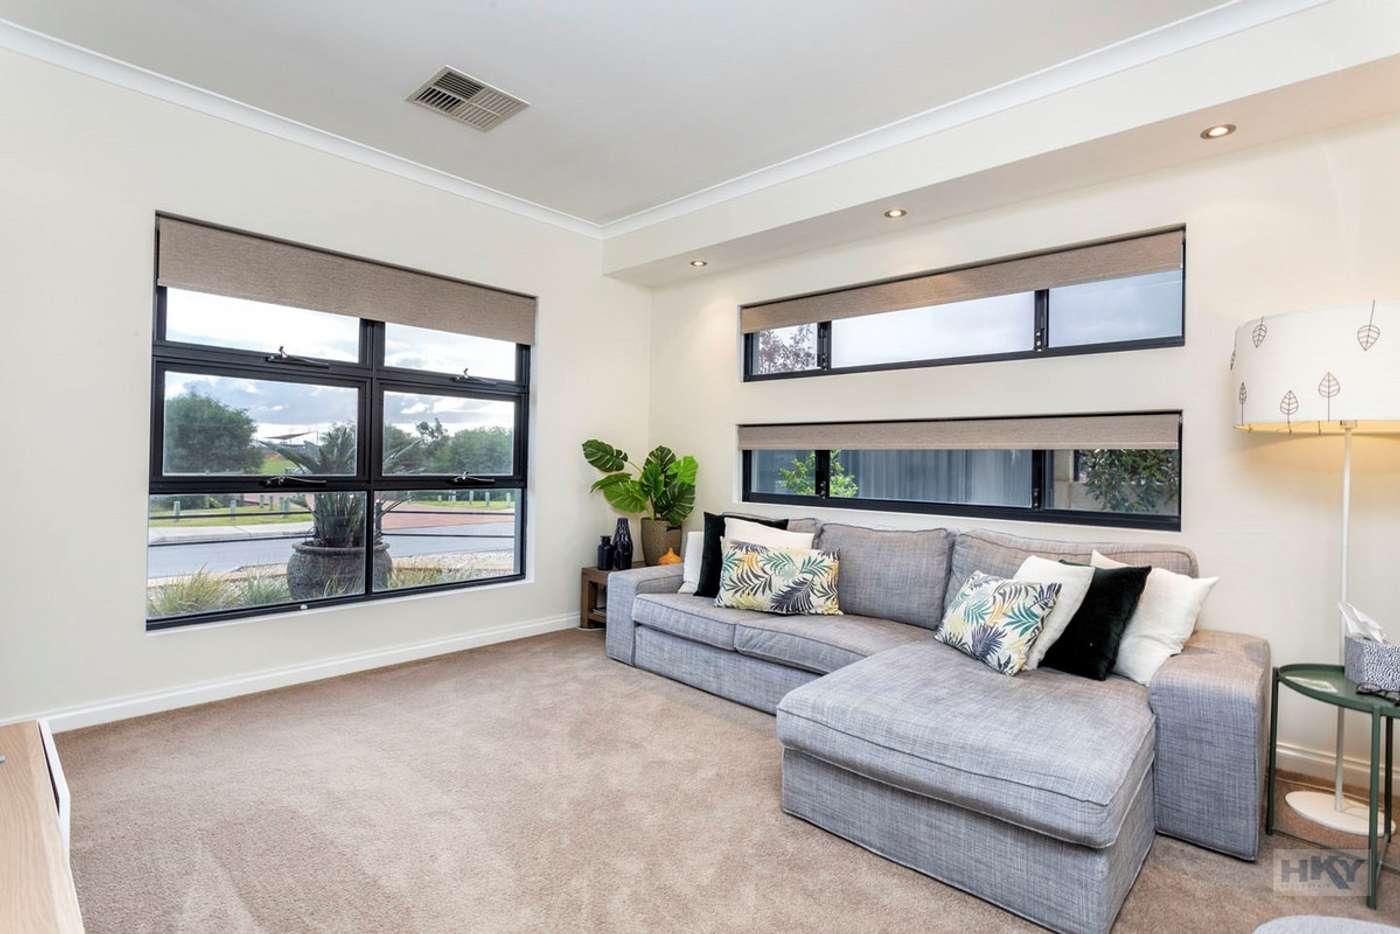 Sixth view of Homely house listing, 30 Flindell Avenue, Caversham WA 6055